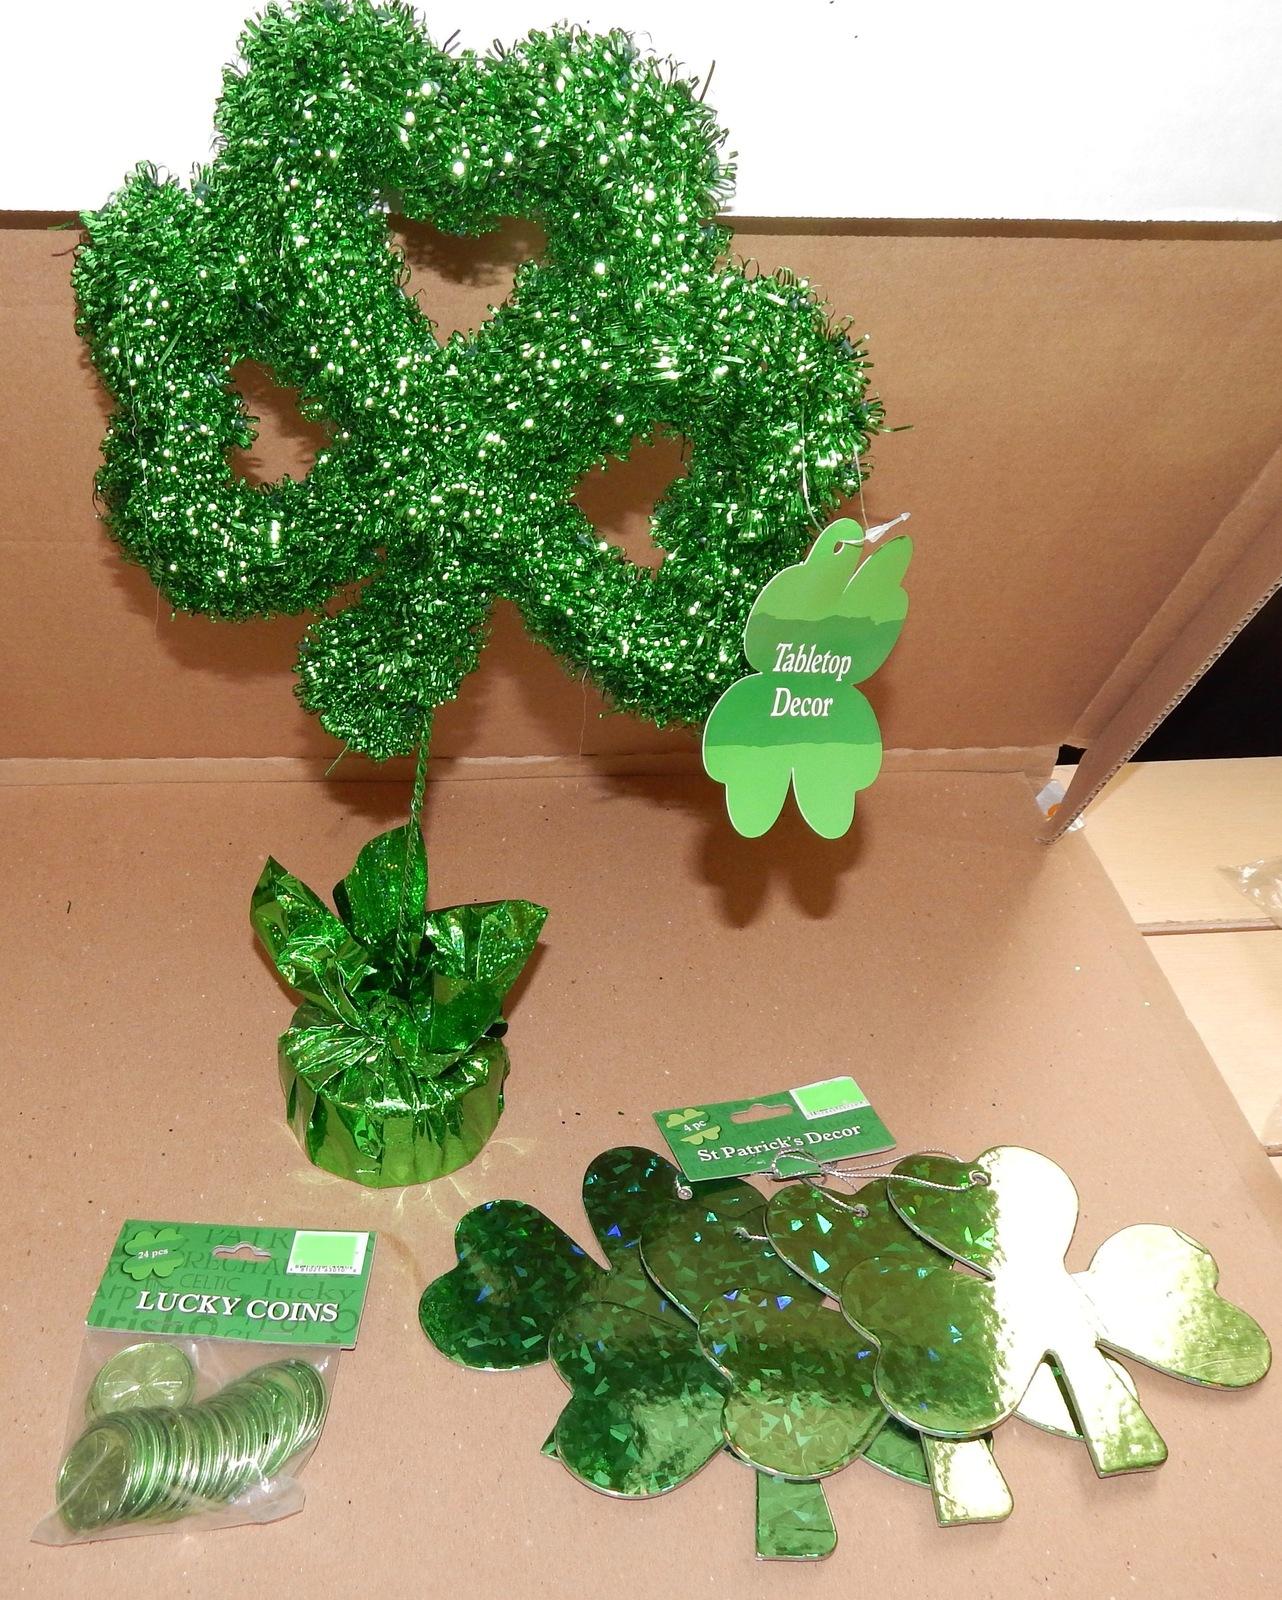 "St.Patricks Day Decor Shamrock 16 ""x 10"" 1 pk Lucky Coins 4pc 6"" Clovers 103Y"